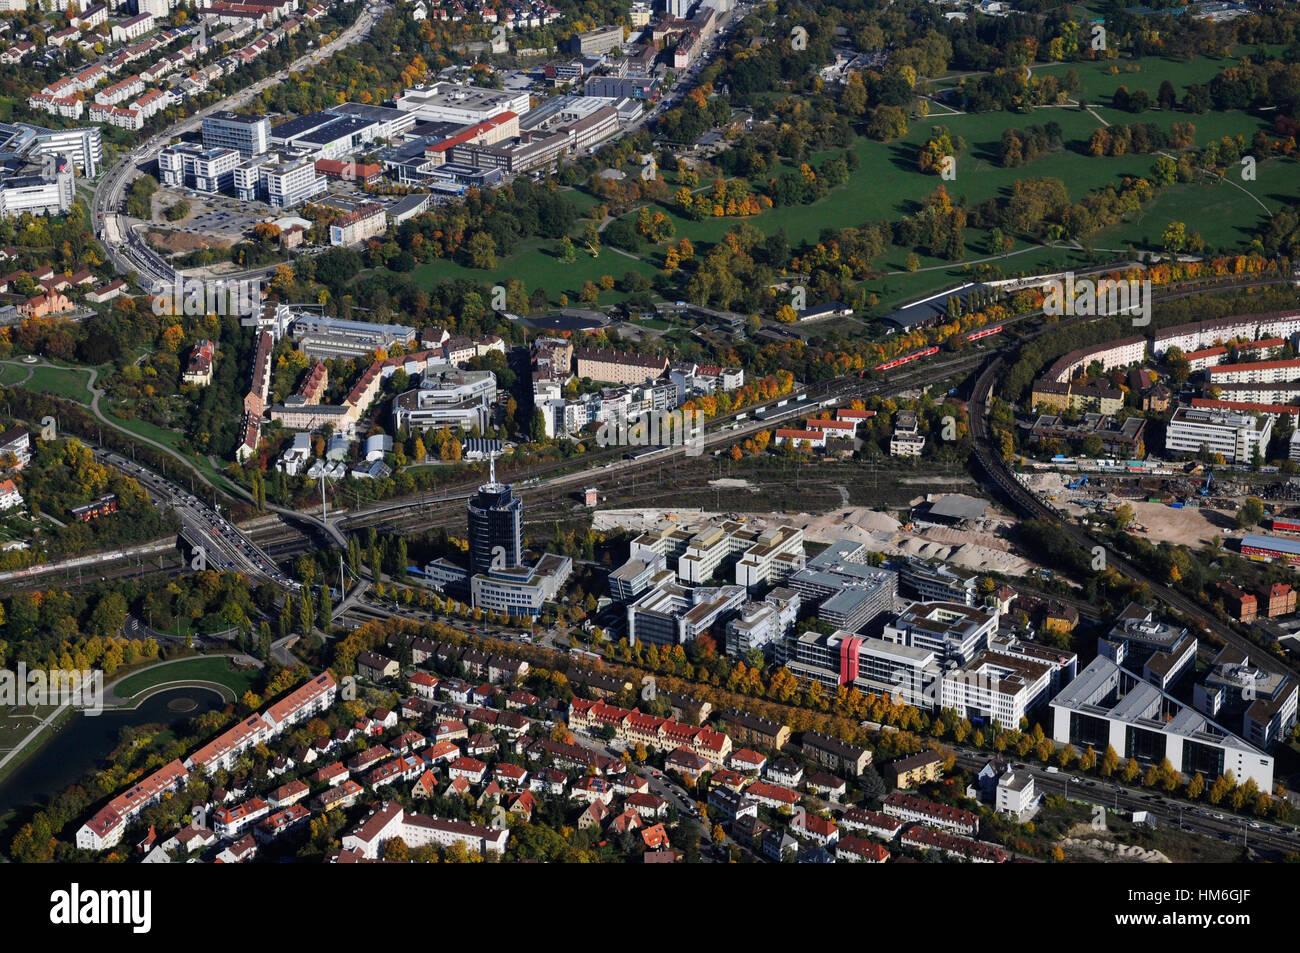 Stuttgart-North, Heilbronner Strasse, Bülow-Turm, Löwentor, Pragstrasse, police headquarters, Äusserer Nordbahnhof Stock Photo